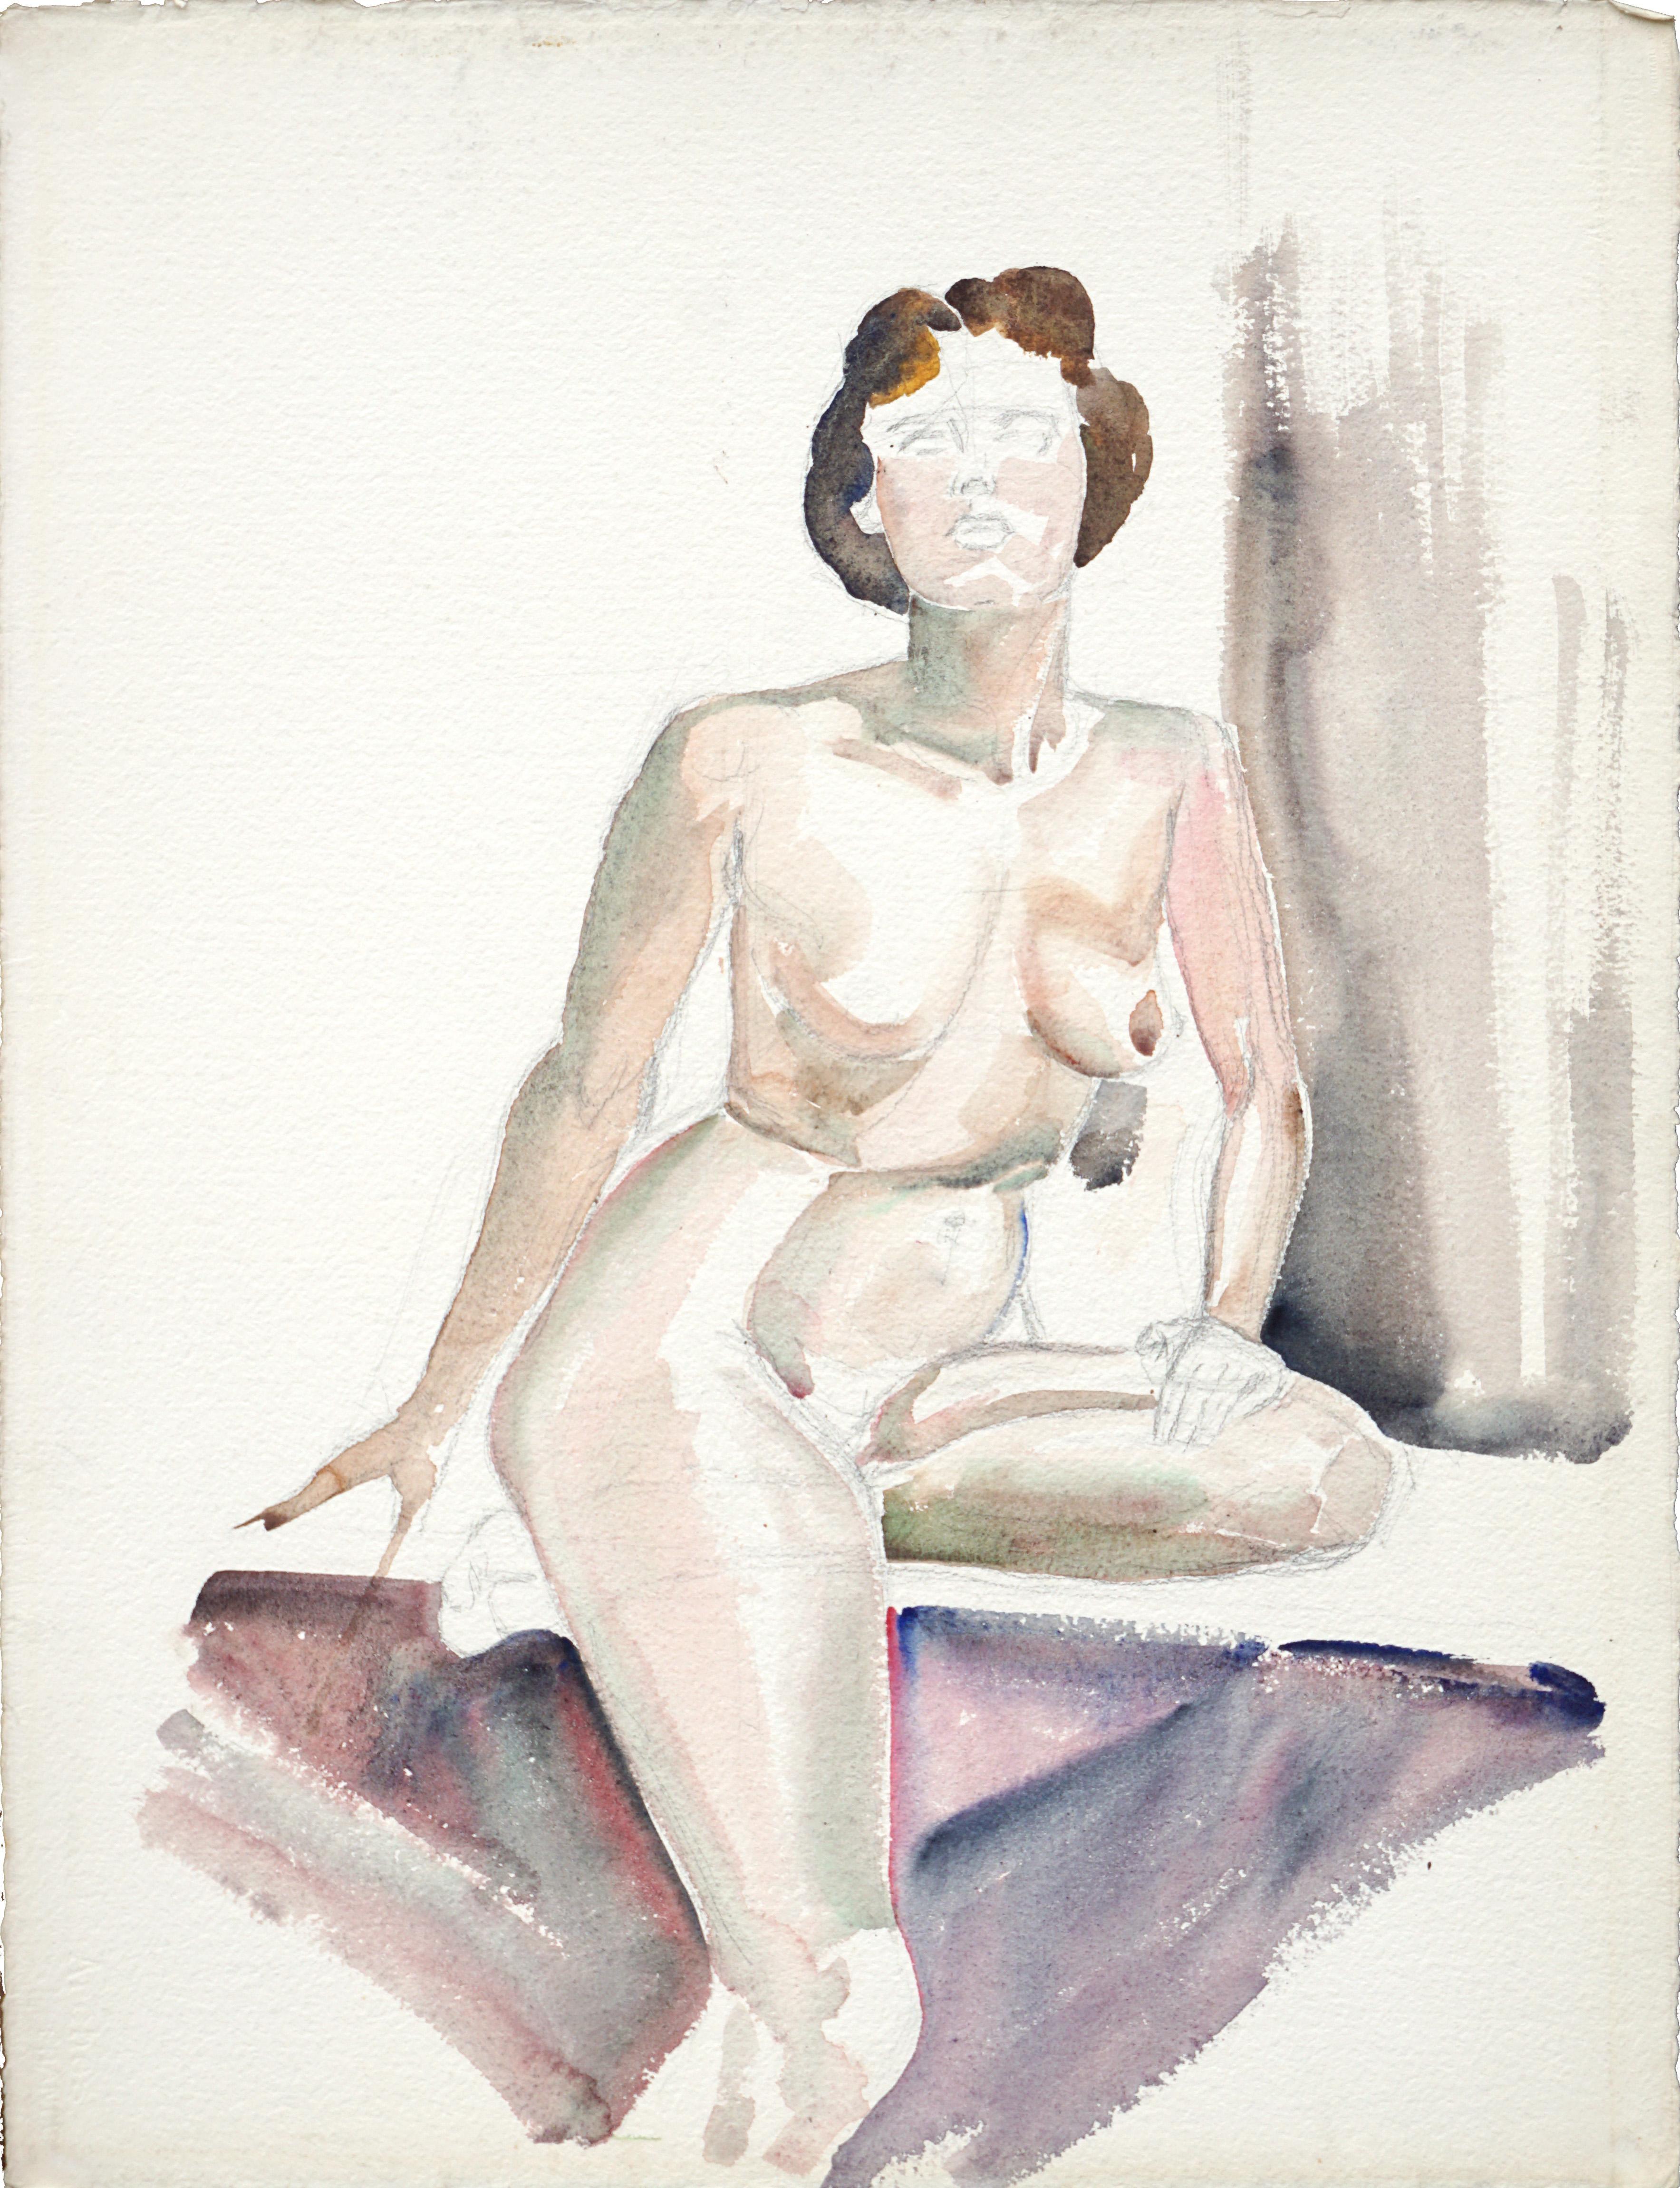 Mid Century Seated Nude Figure Study (unfinished)